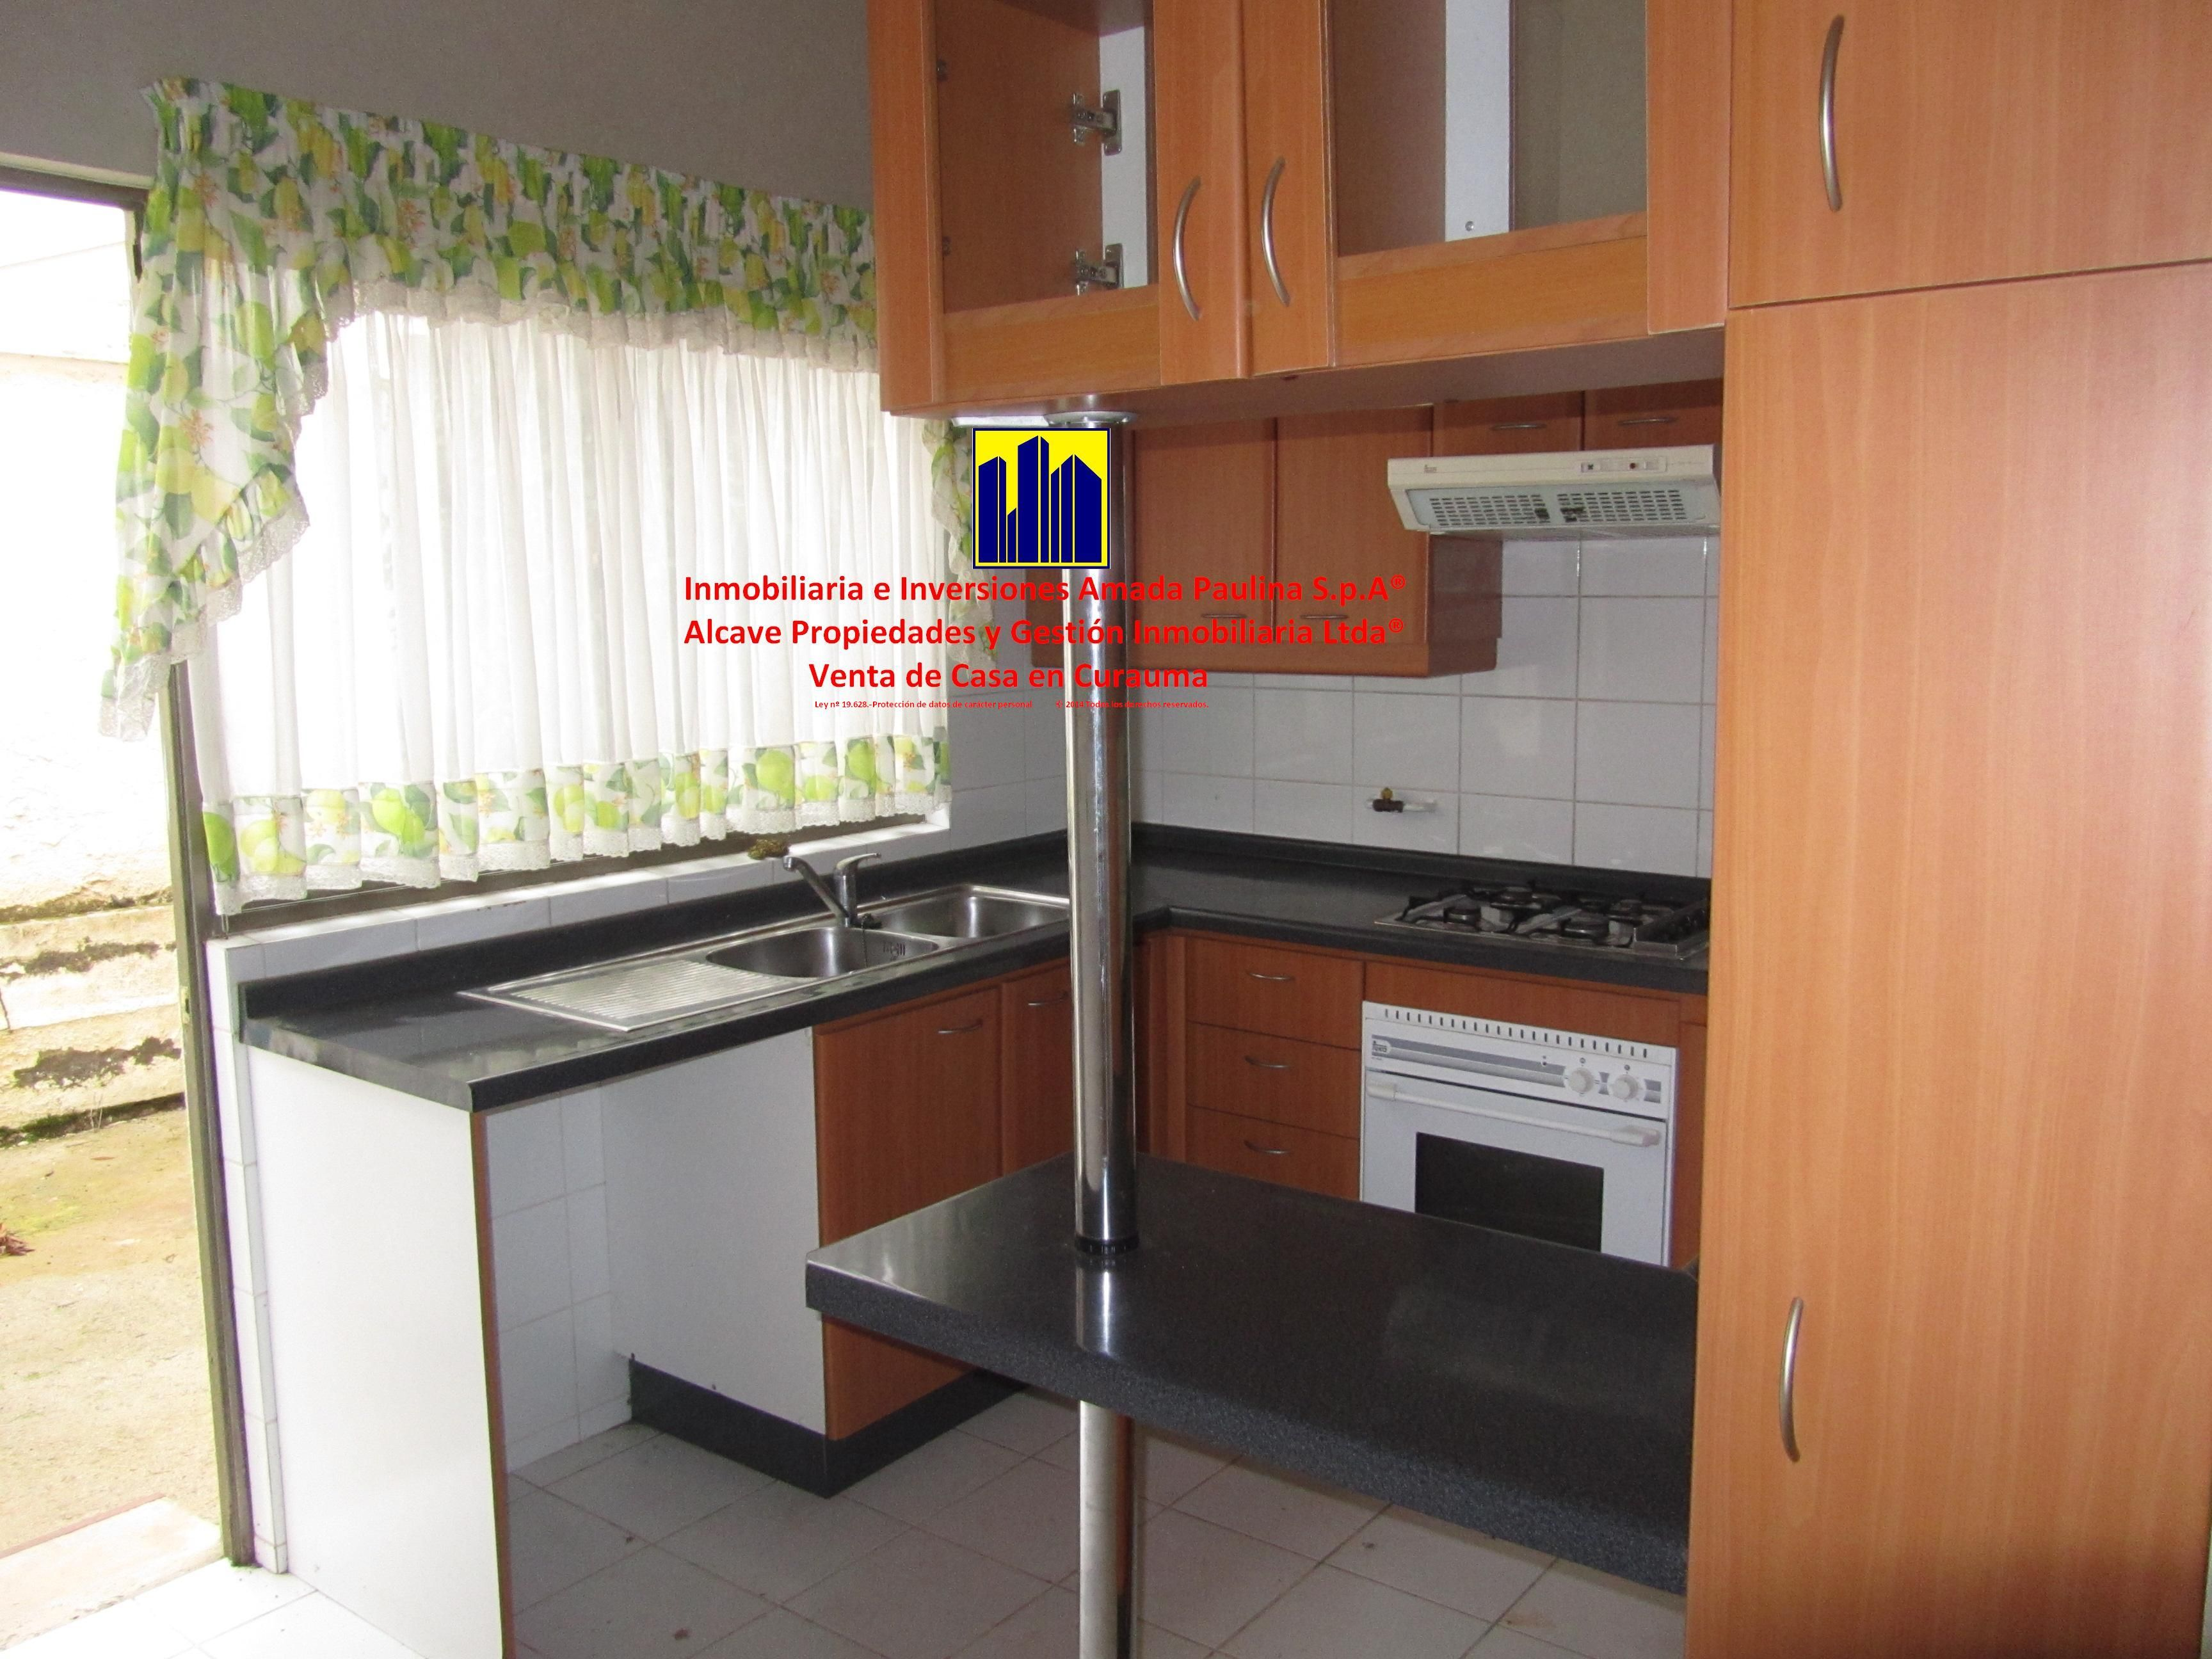 6.Inmobiliaria e Inversiones Amada Paulina S.p.A® Alcave